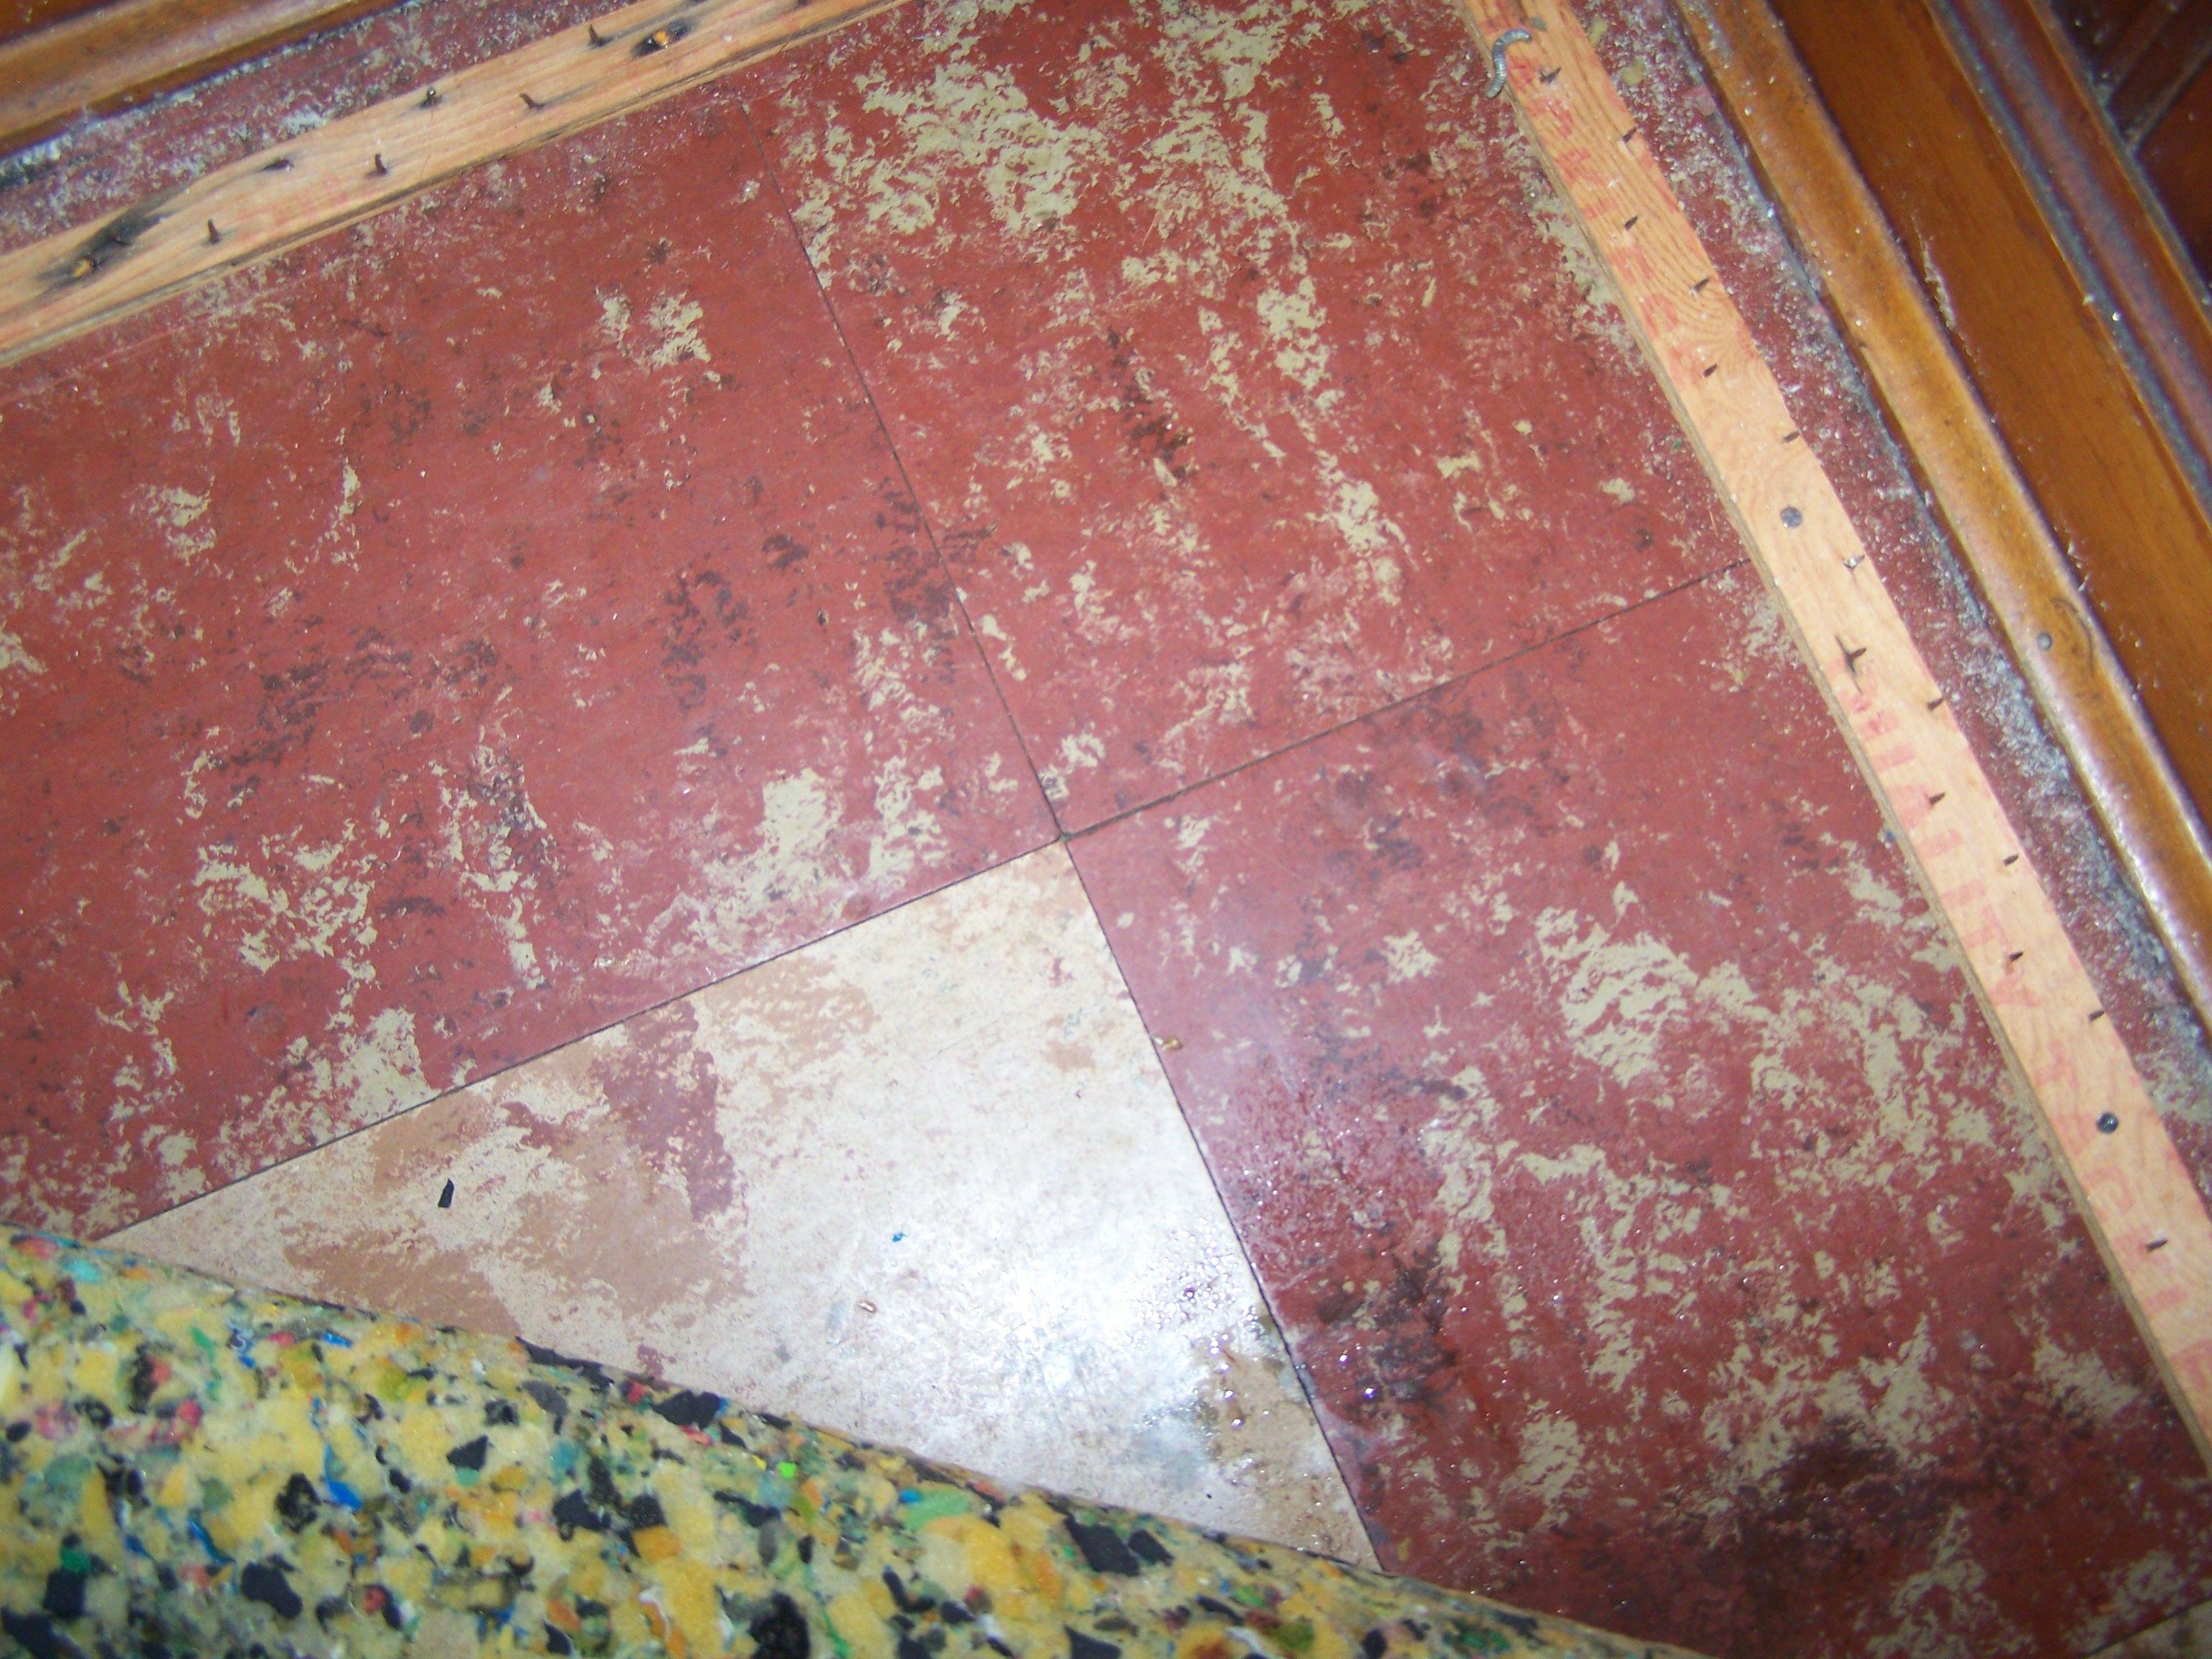 312 850 9010 Asbestos Floor Tile Removal Chicago Company